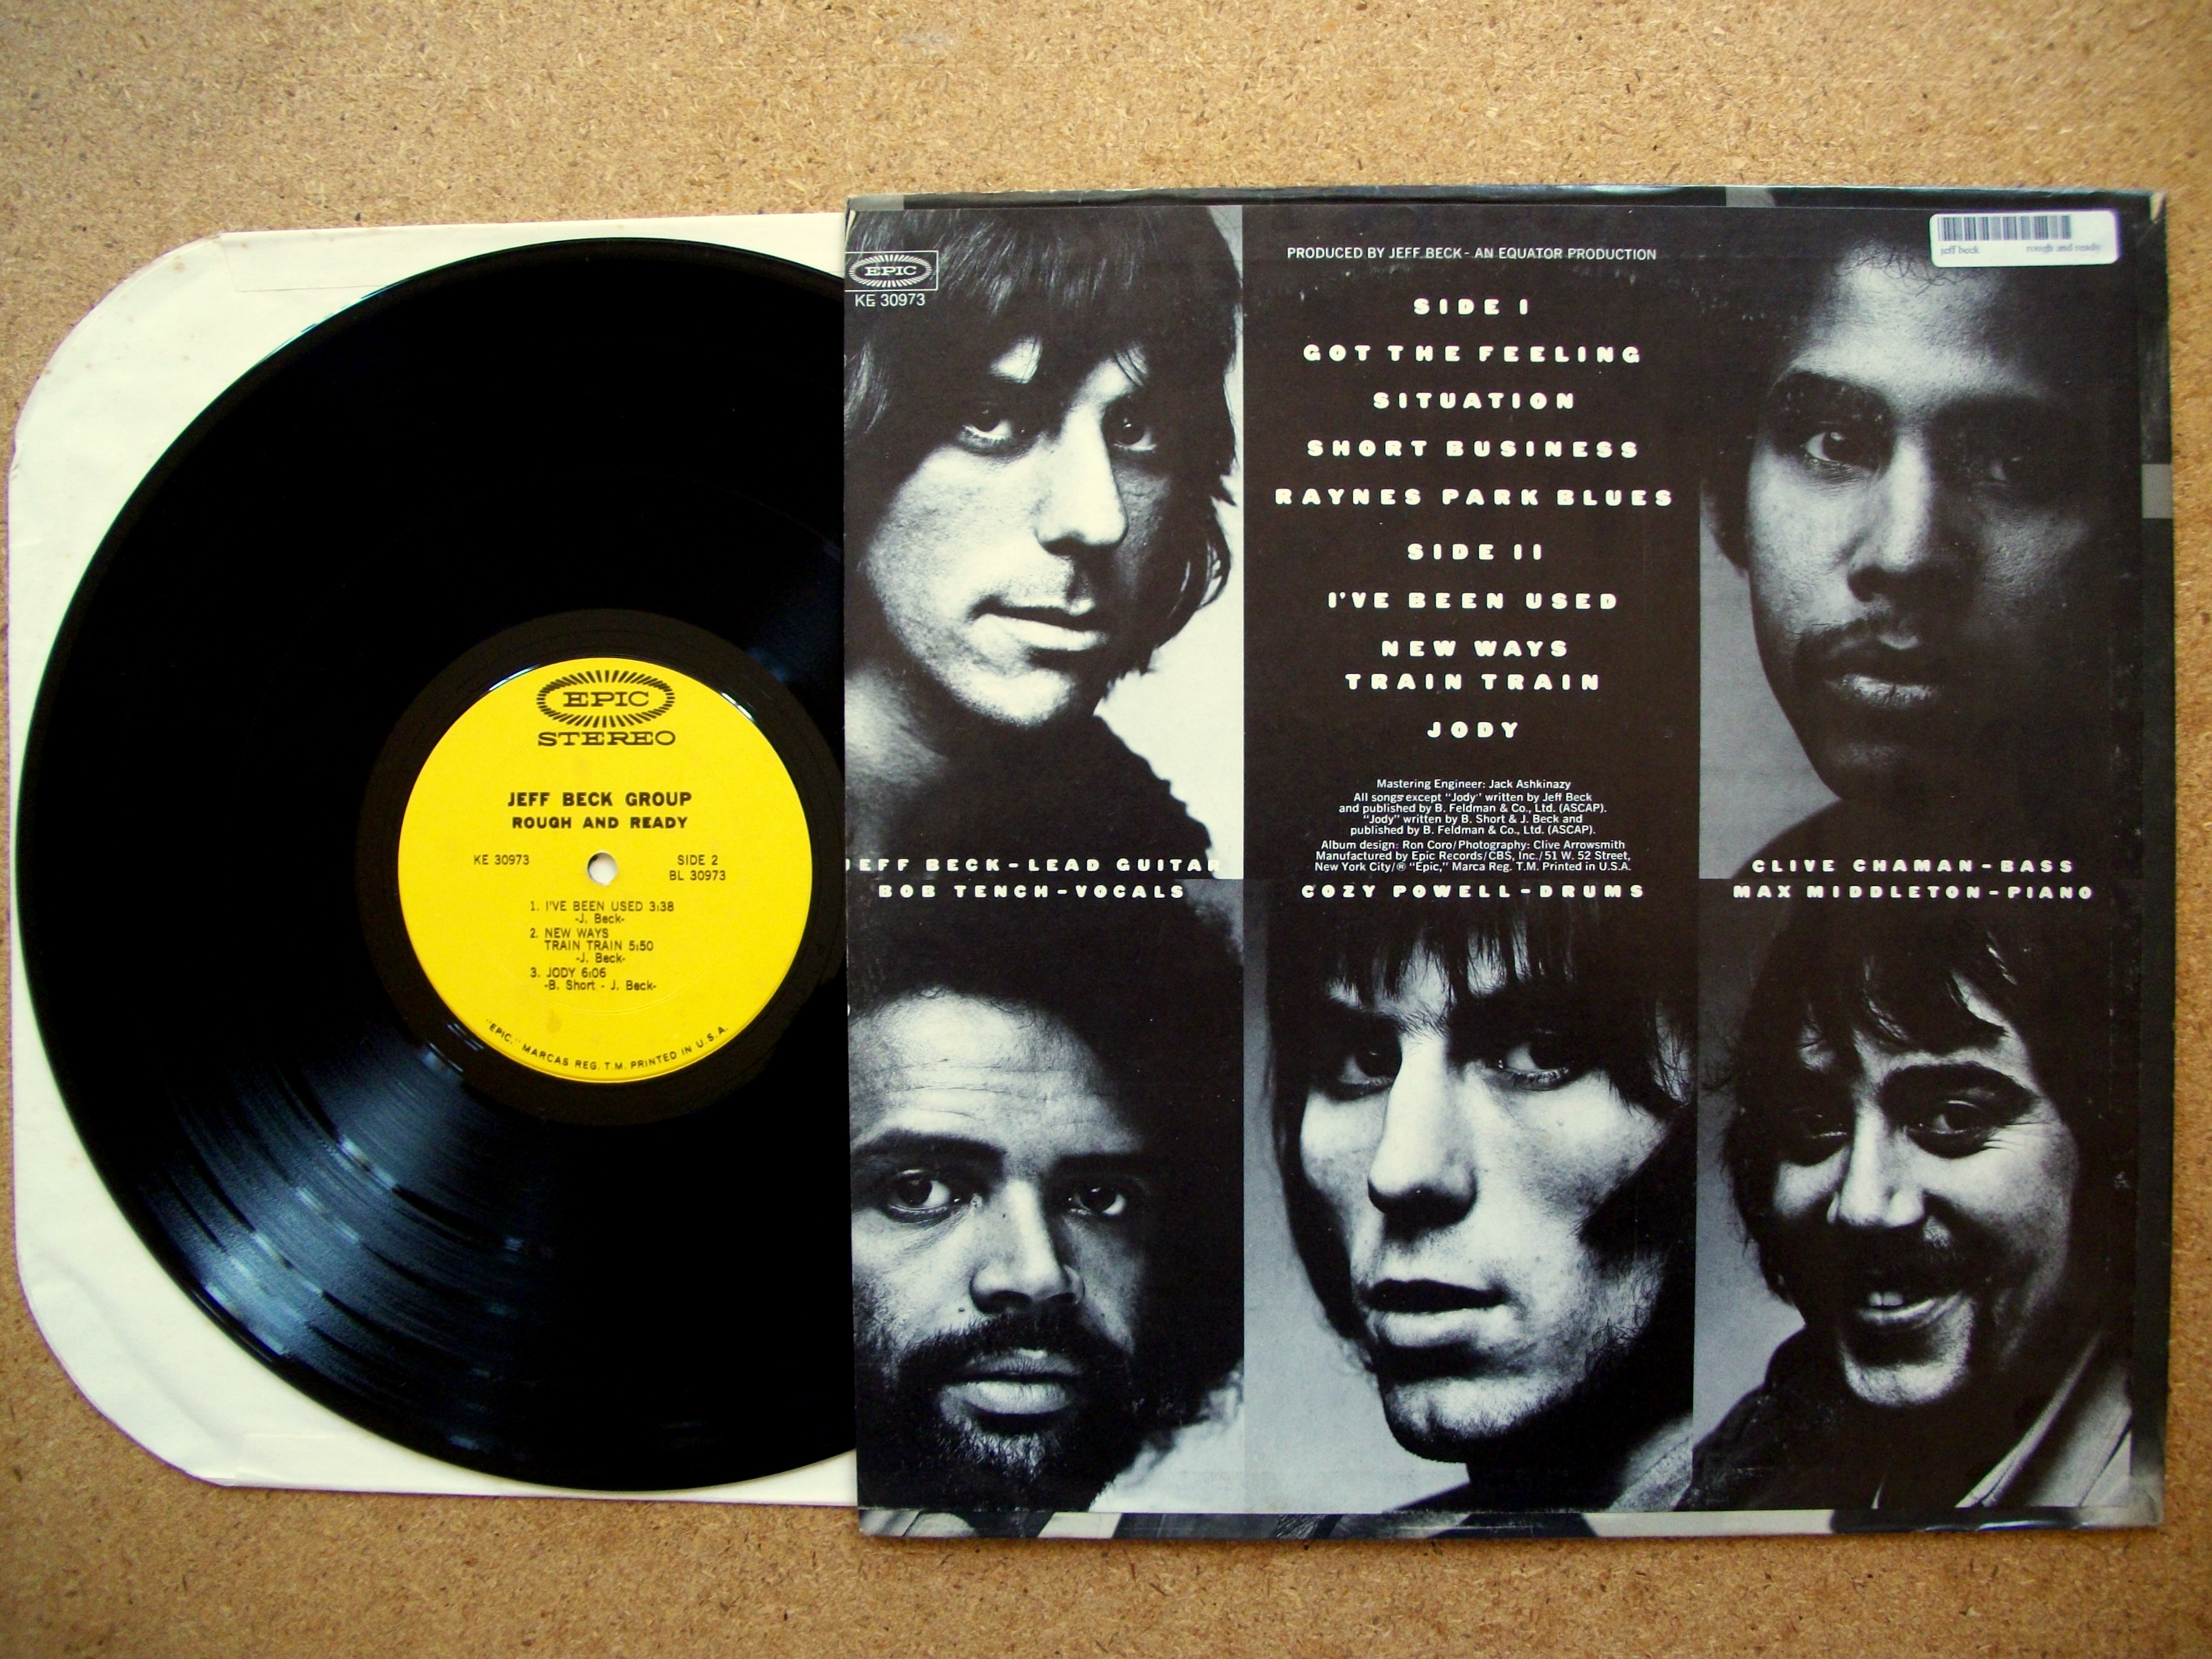 Jeff Beck Group-Got the Feeling